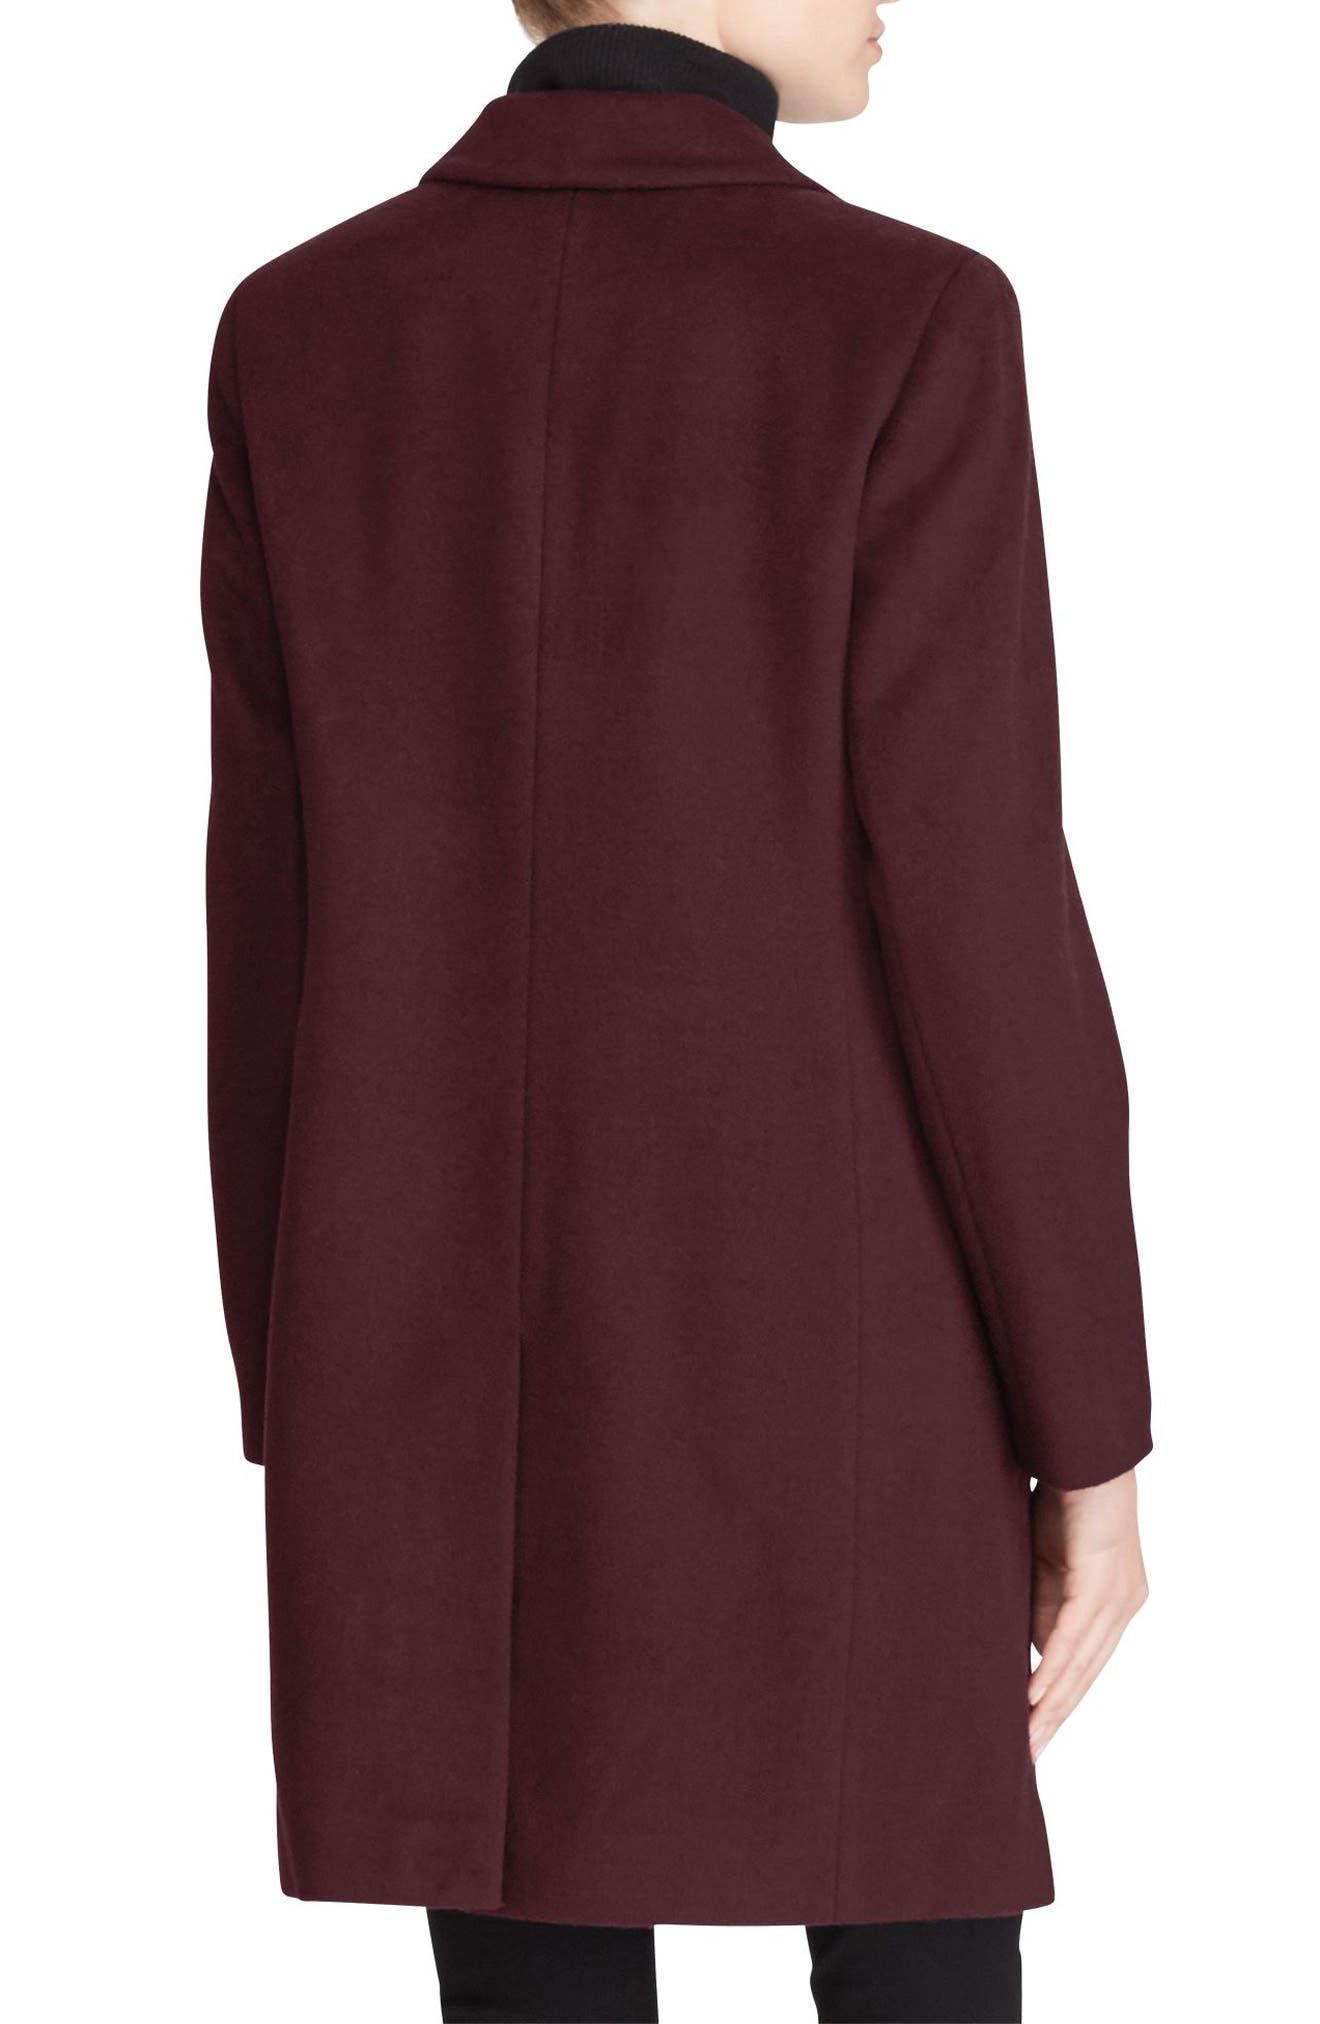 Wool Blend Reefer Coat,                             Alternate thumbnail 27, color,